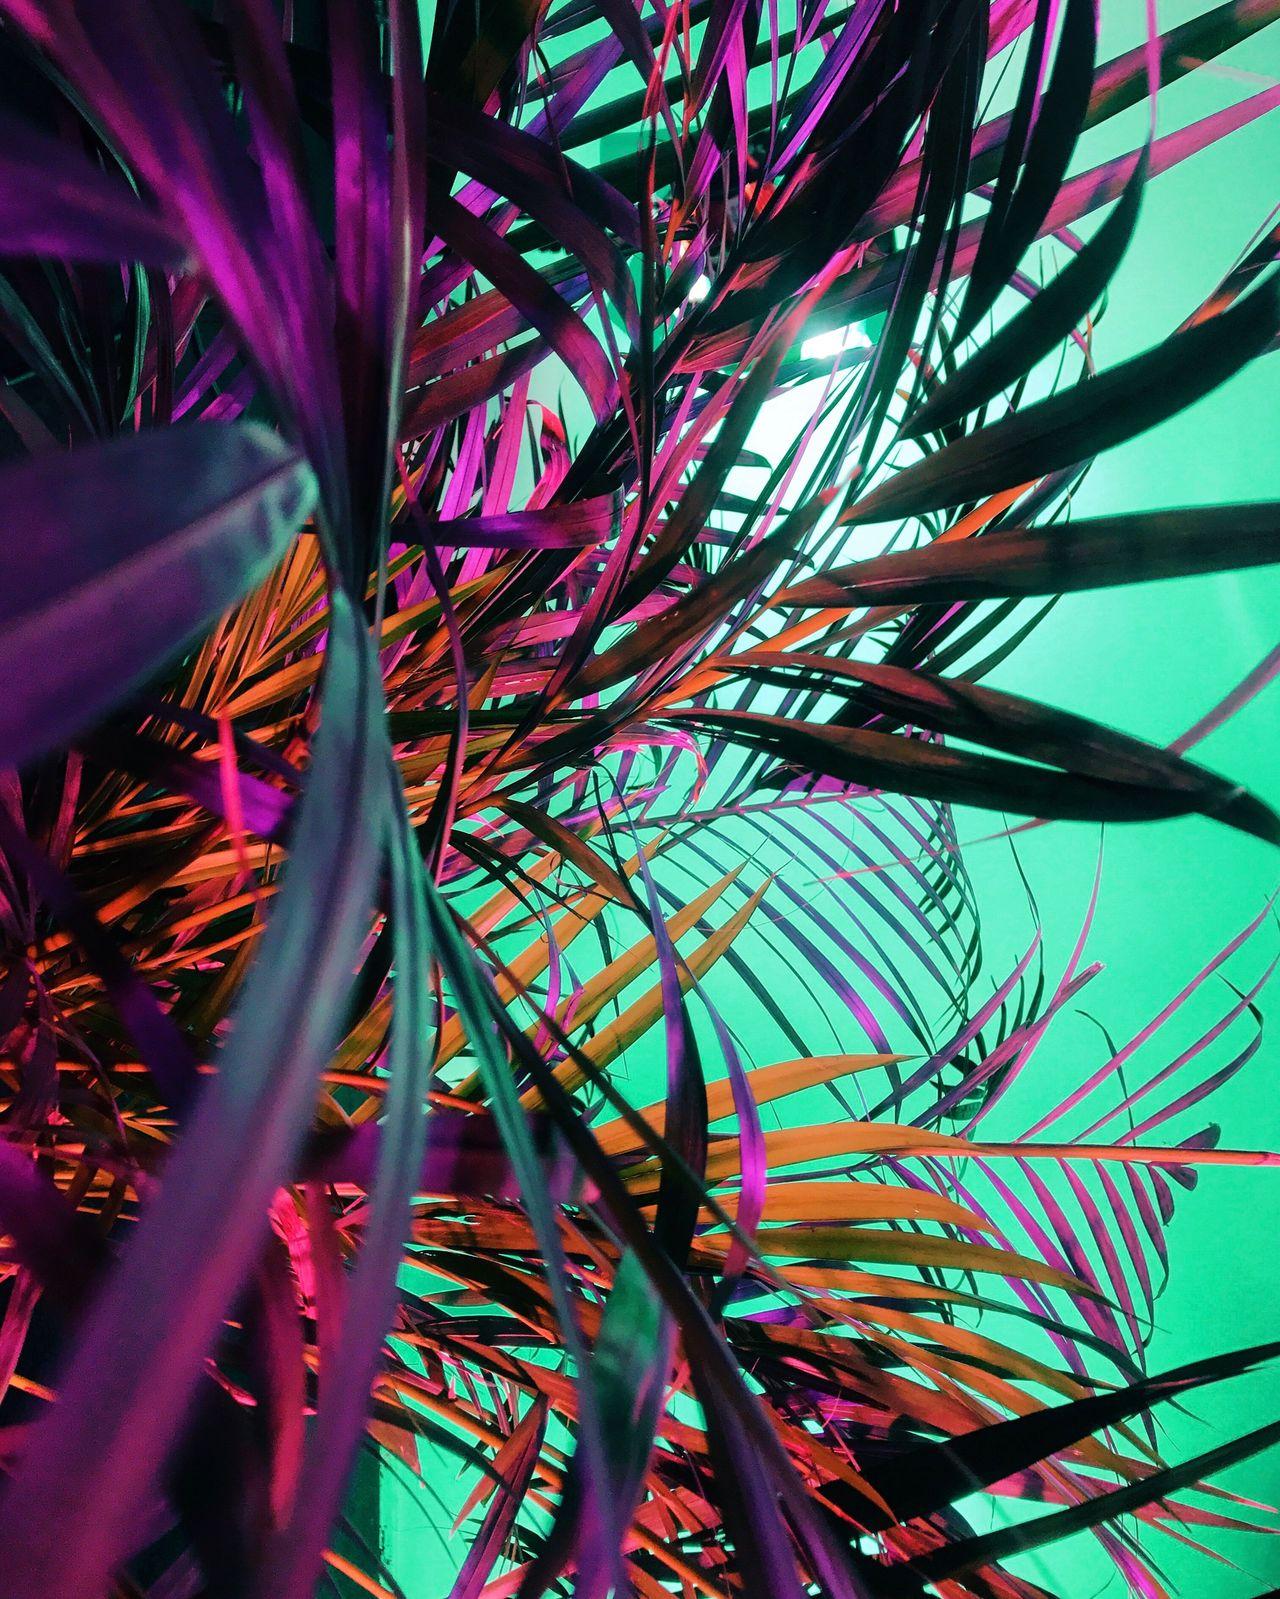 Jungle Plant Neon Still Life Studio Shoot Studio Shot Studio Photography Backgrounds Colorful